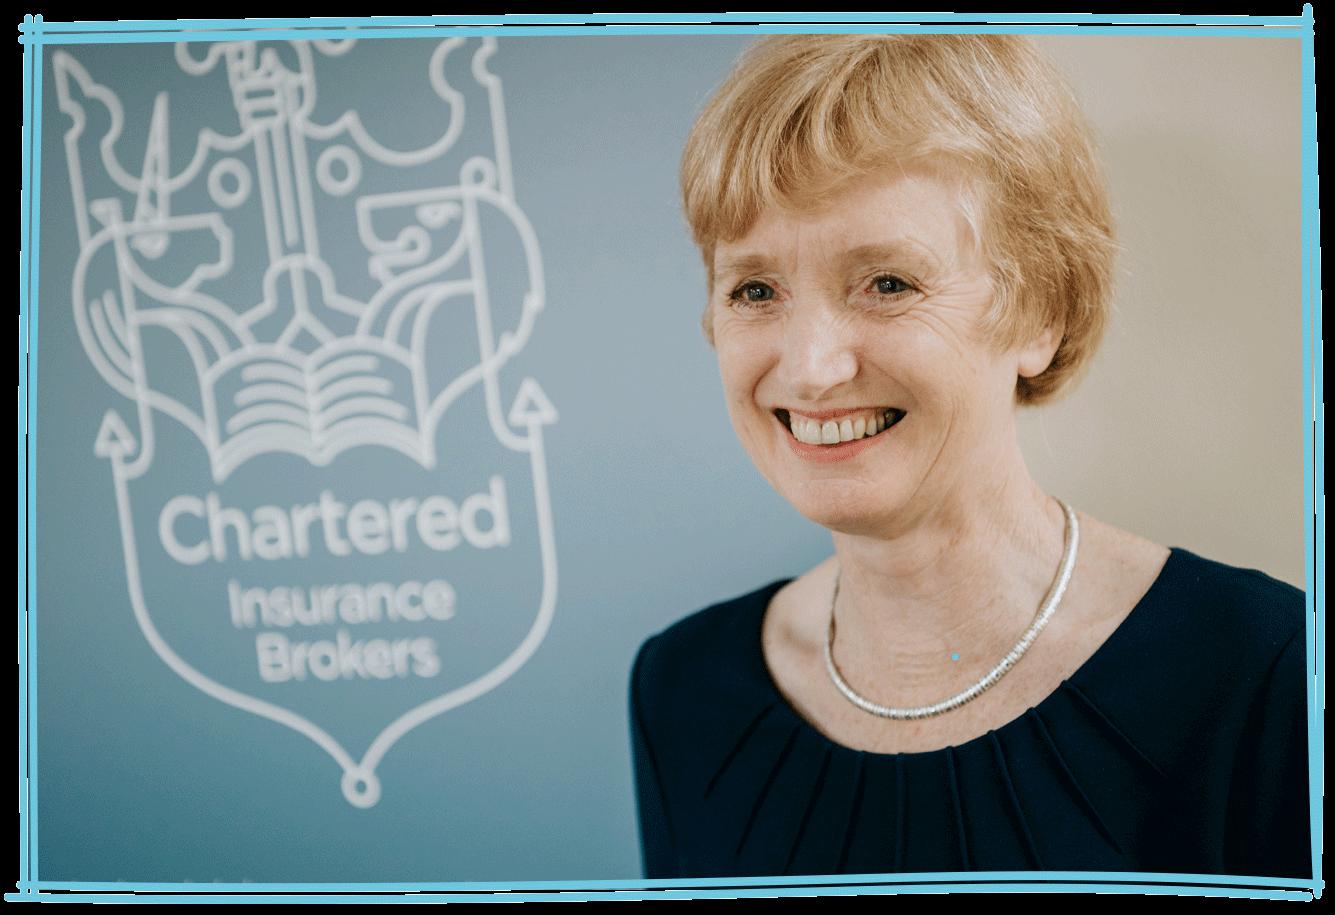 Janet Ferguson Stanmore Insurance Profile Picture